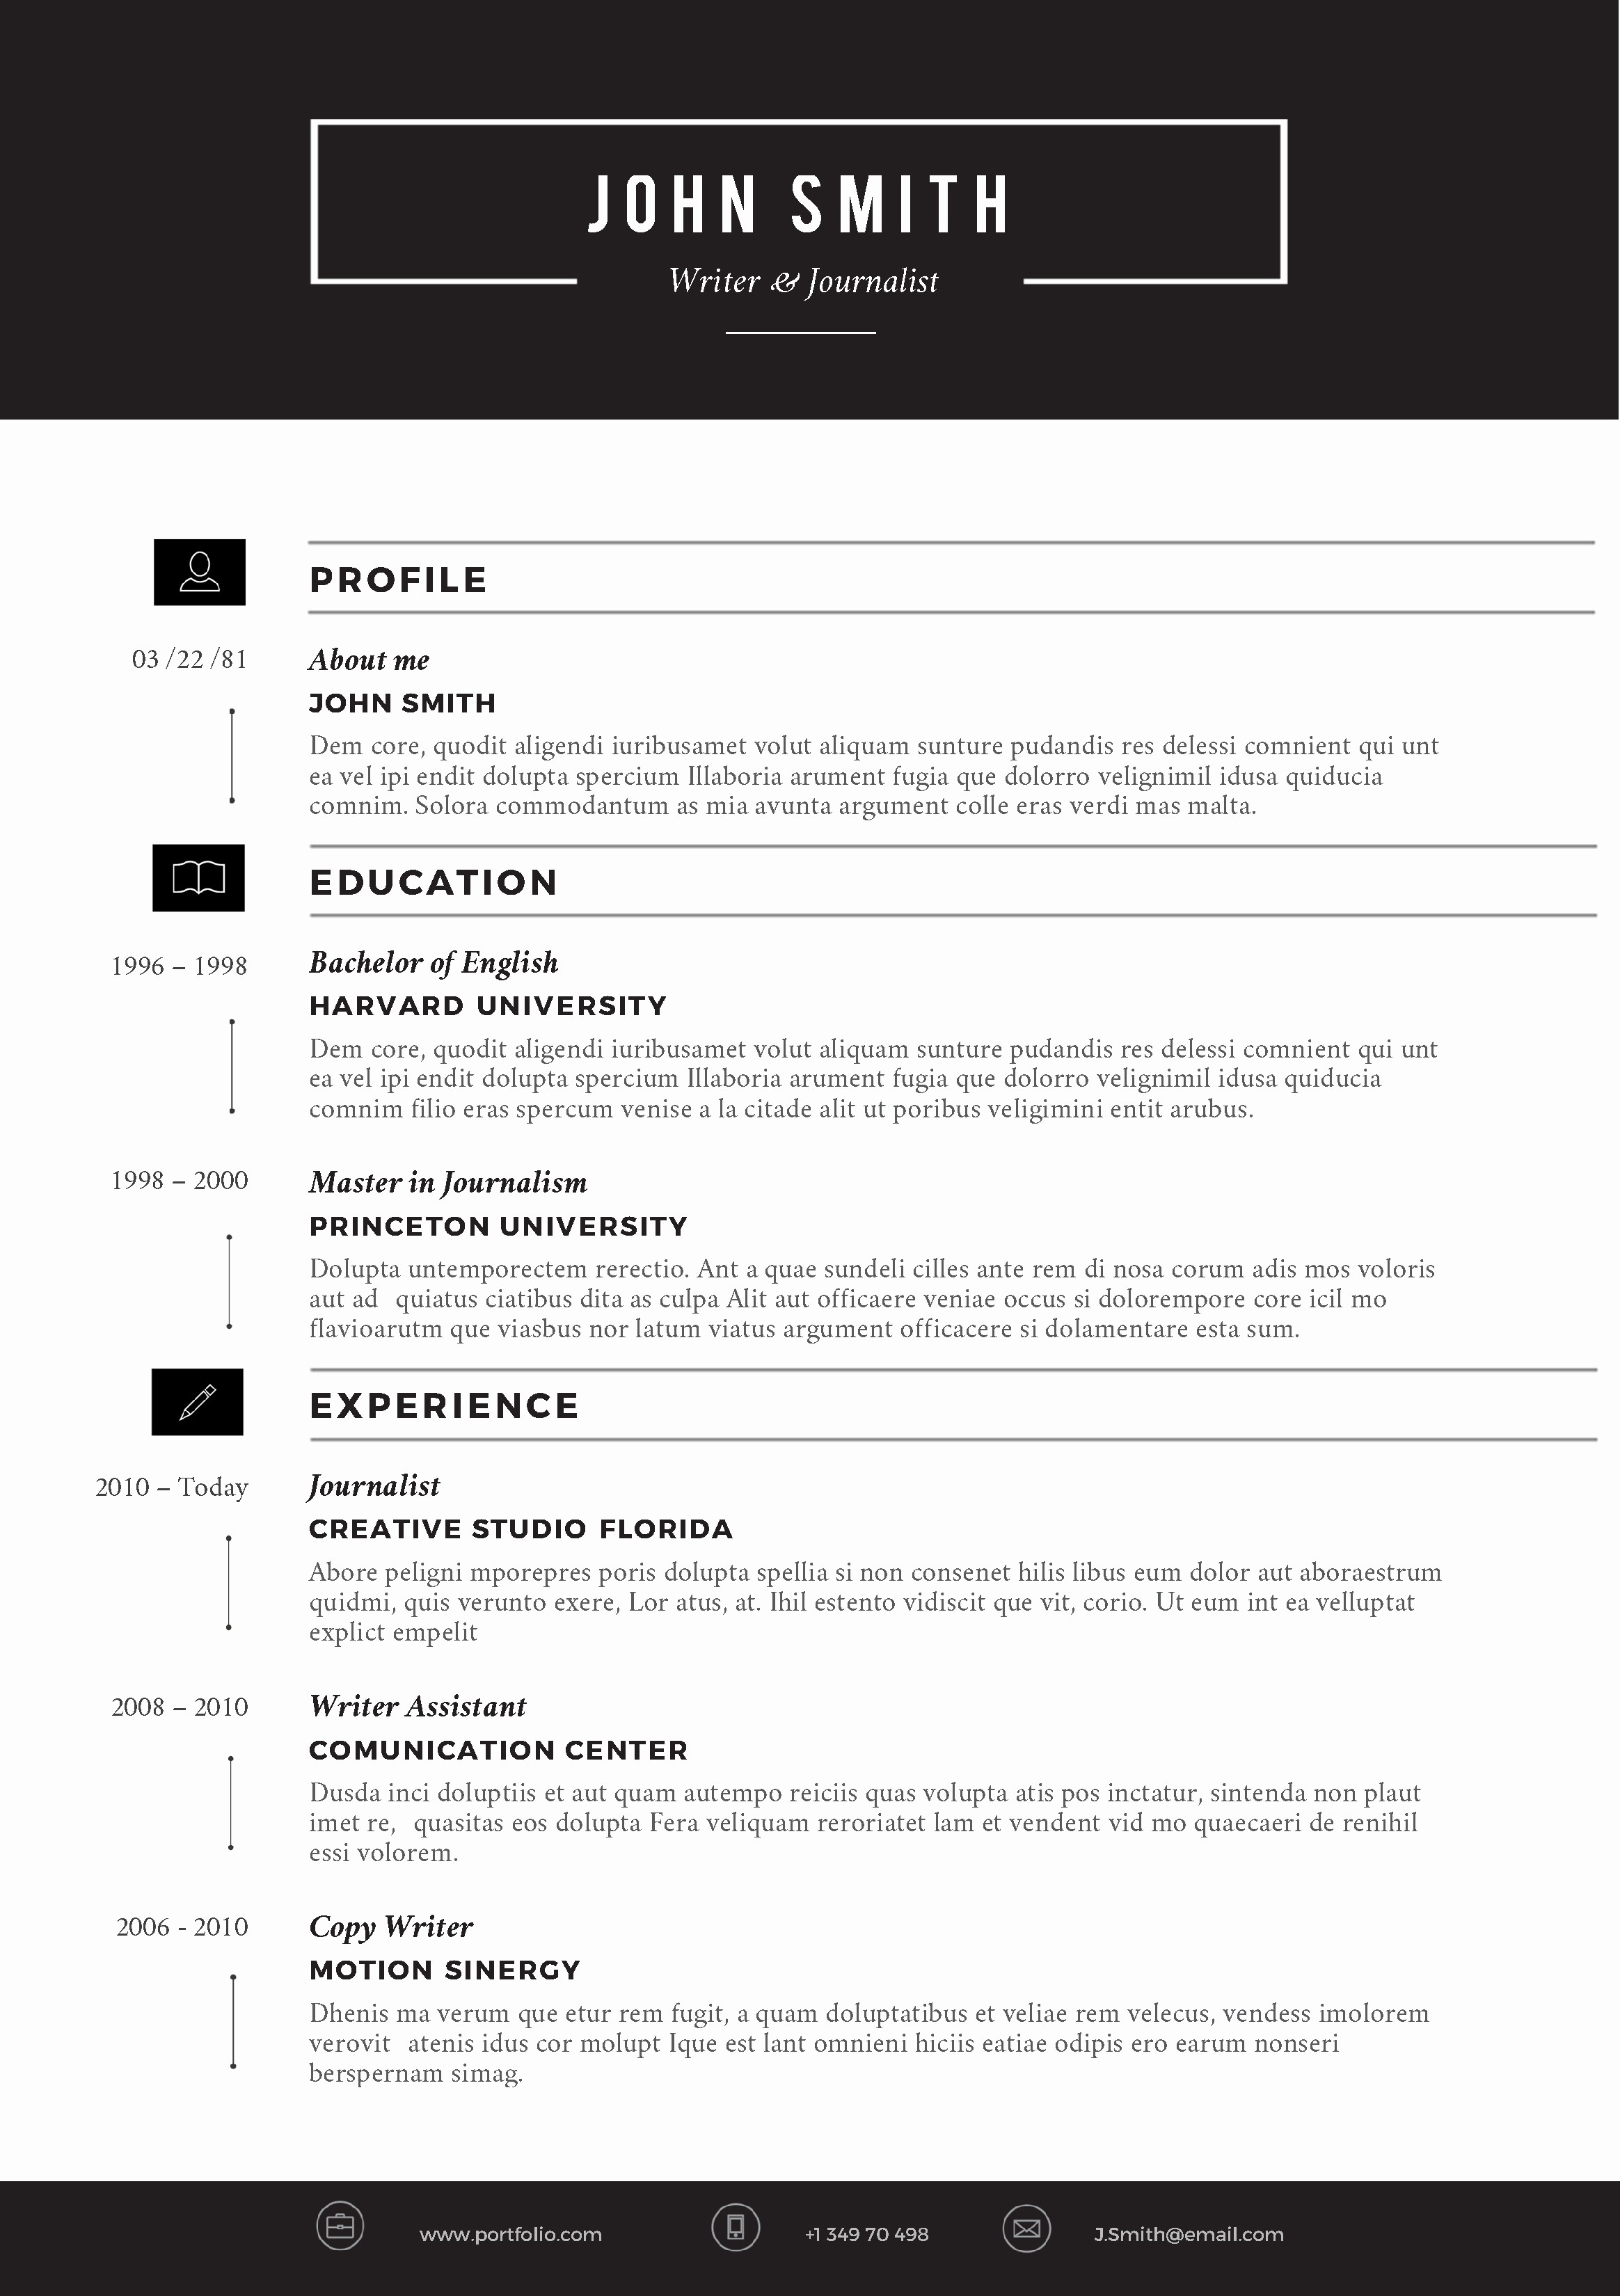 Best Ms Word Resume Template Elegant Cvfolio Best 10 Resume Templates for Microsoft Word